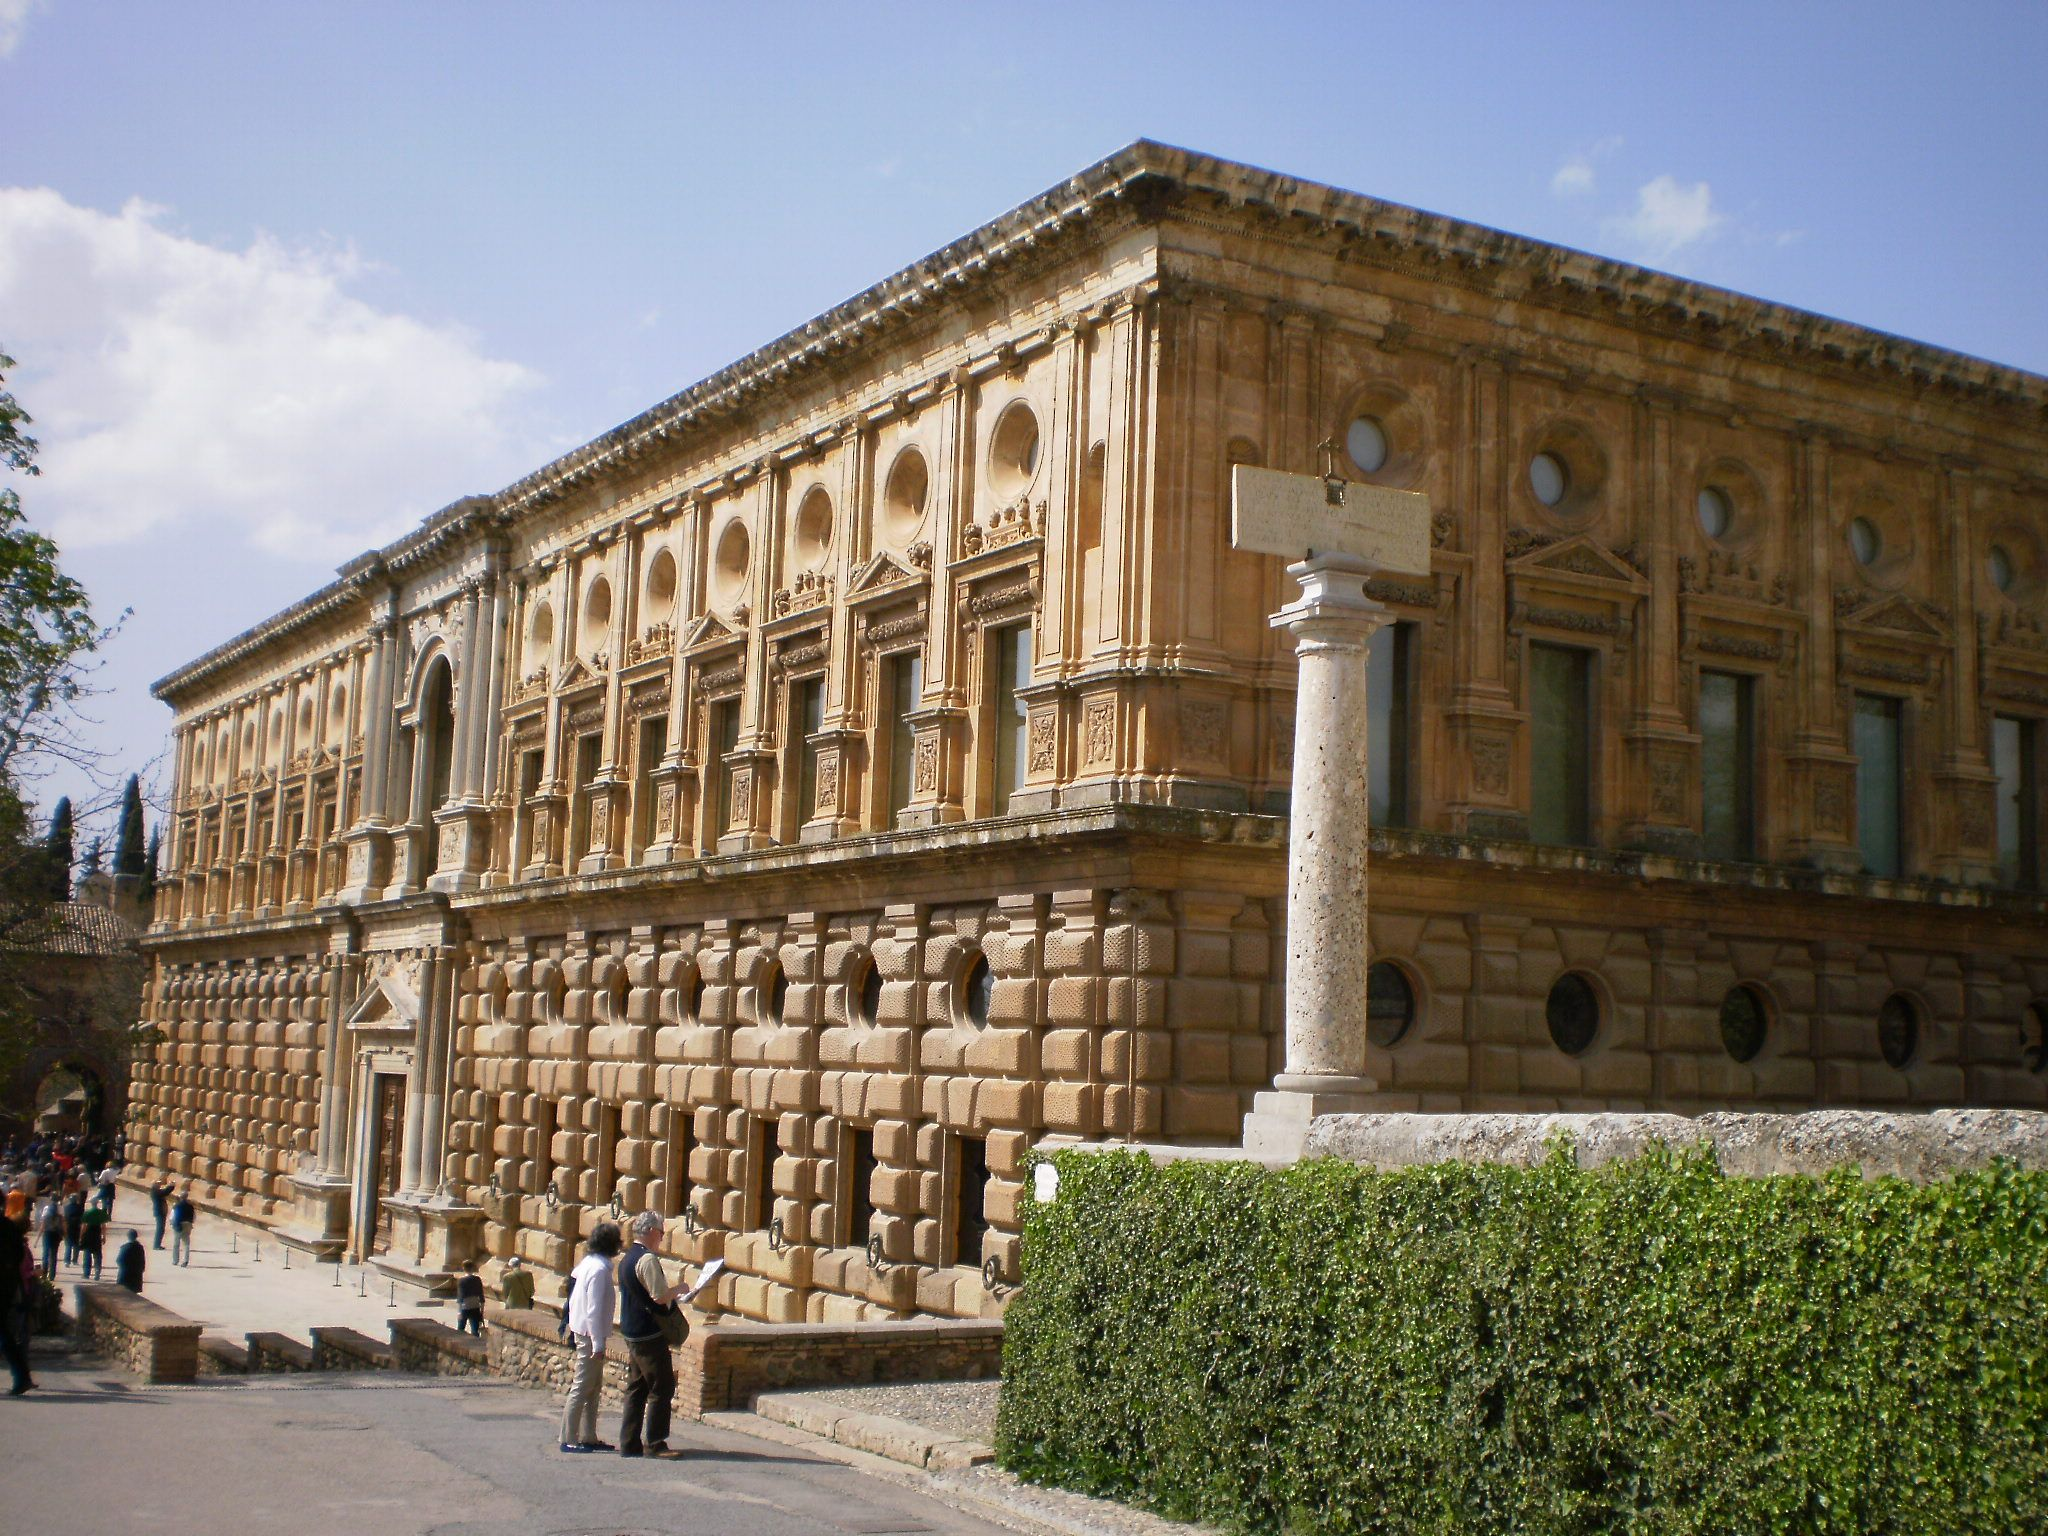 File:Palacio de Carlos V 01.JPG - Wikimedia Commons